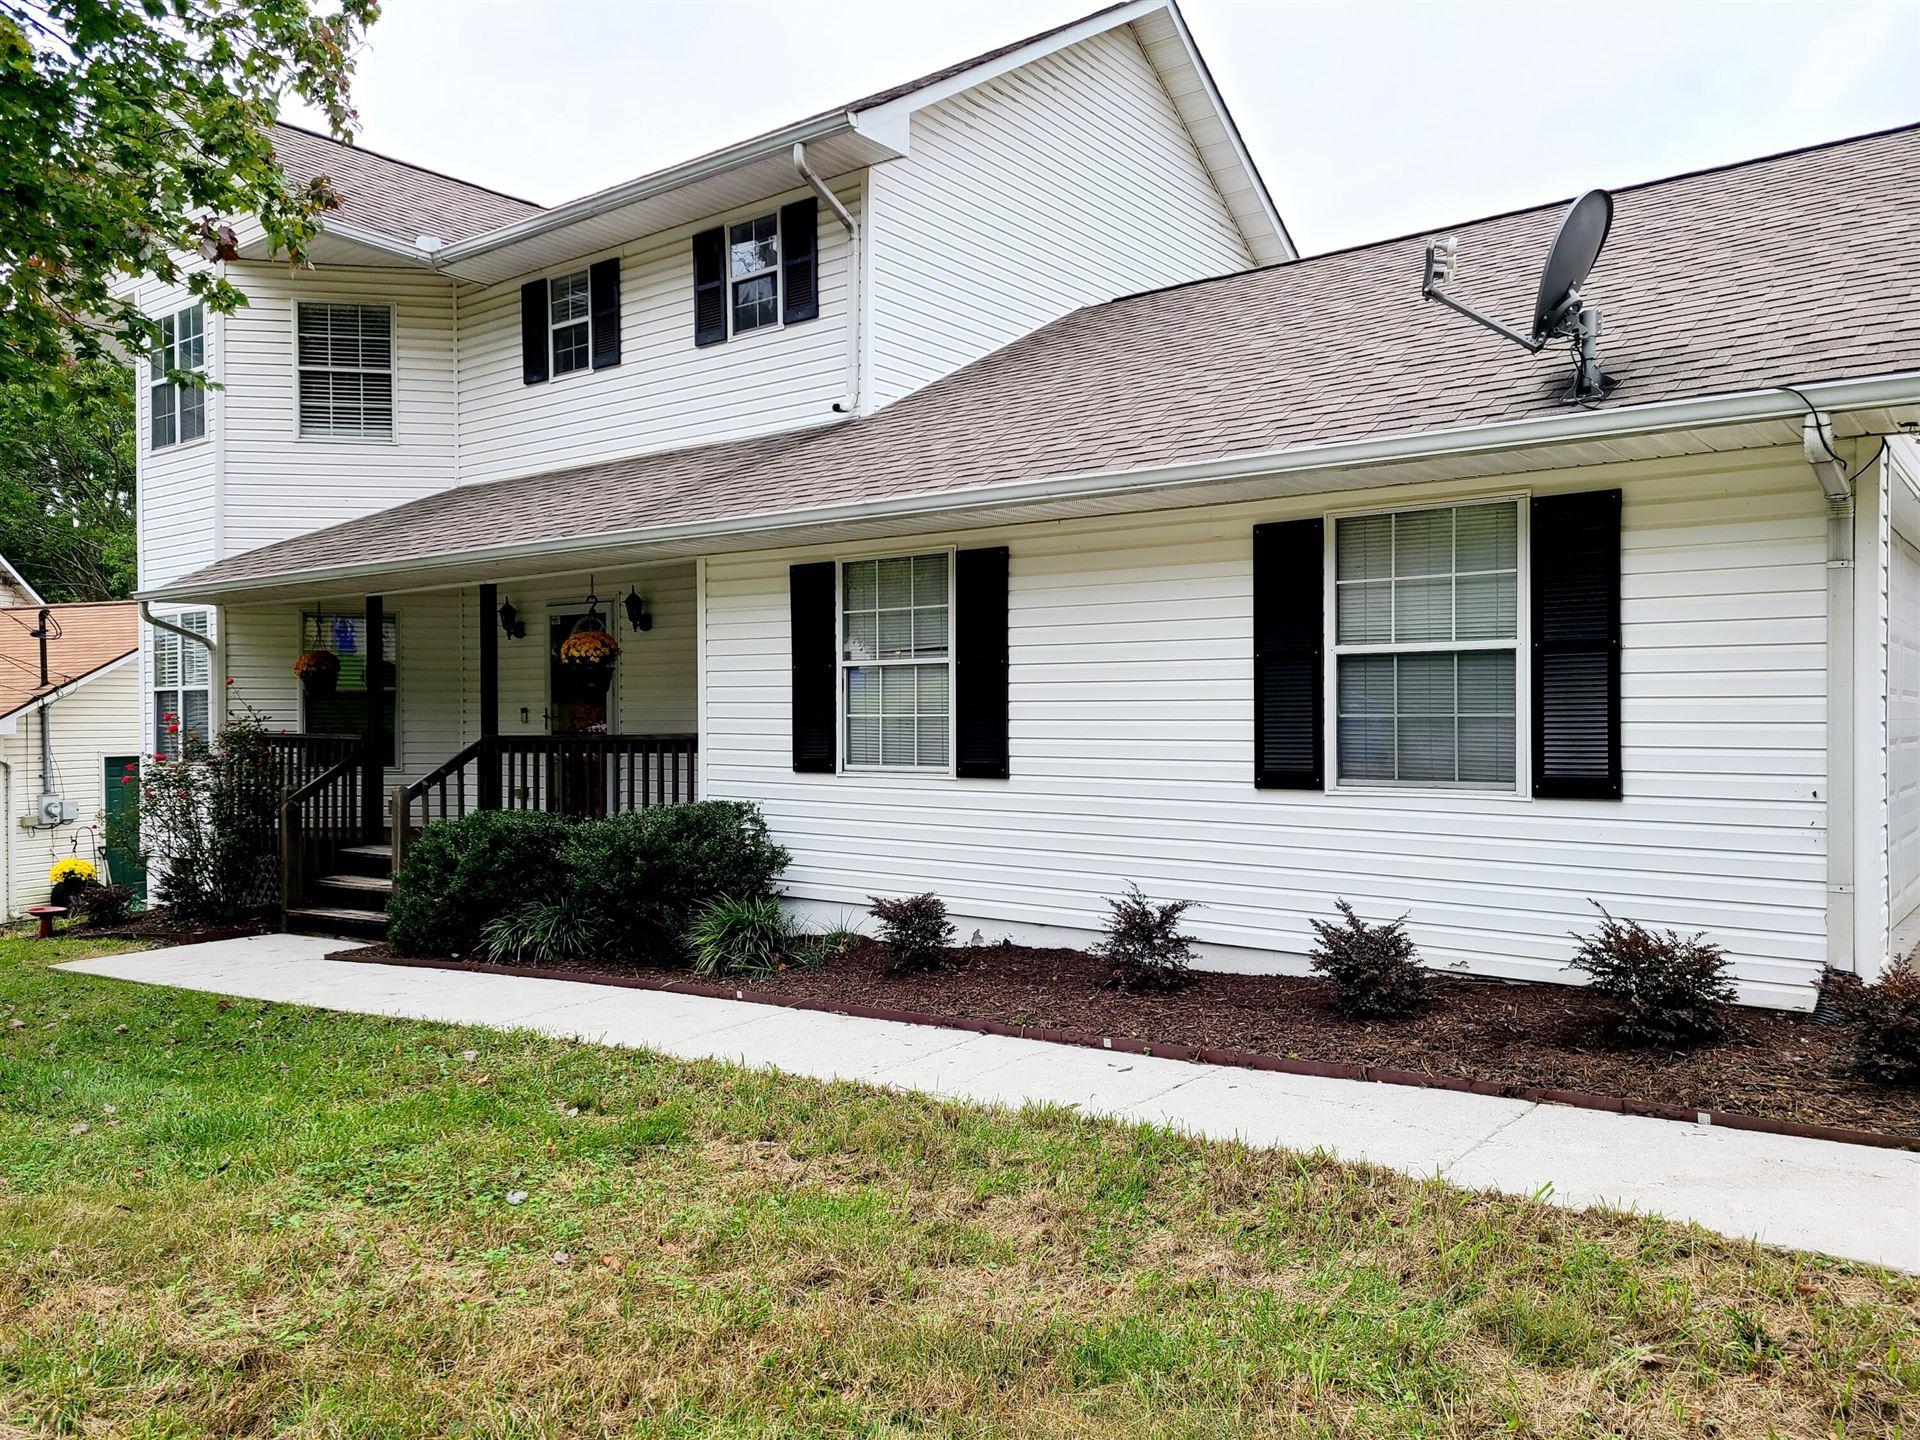 Photo of 6801 Drybrook Lane, Knoxville, TN 37921 (MLS # 1170407)